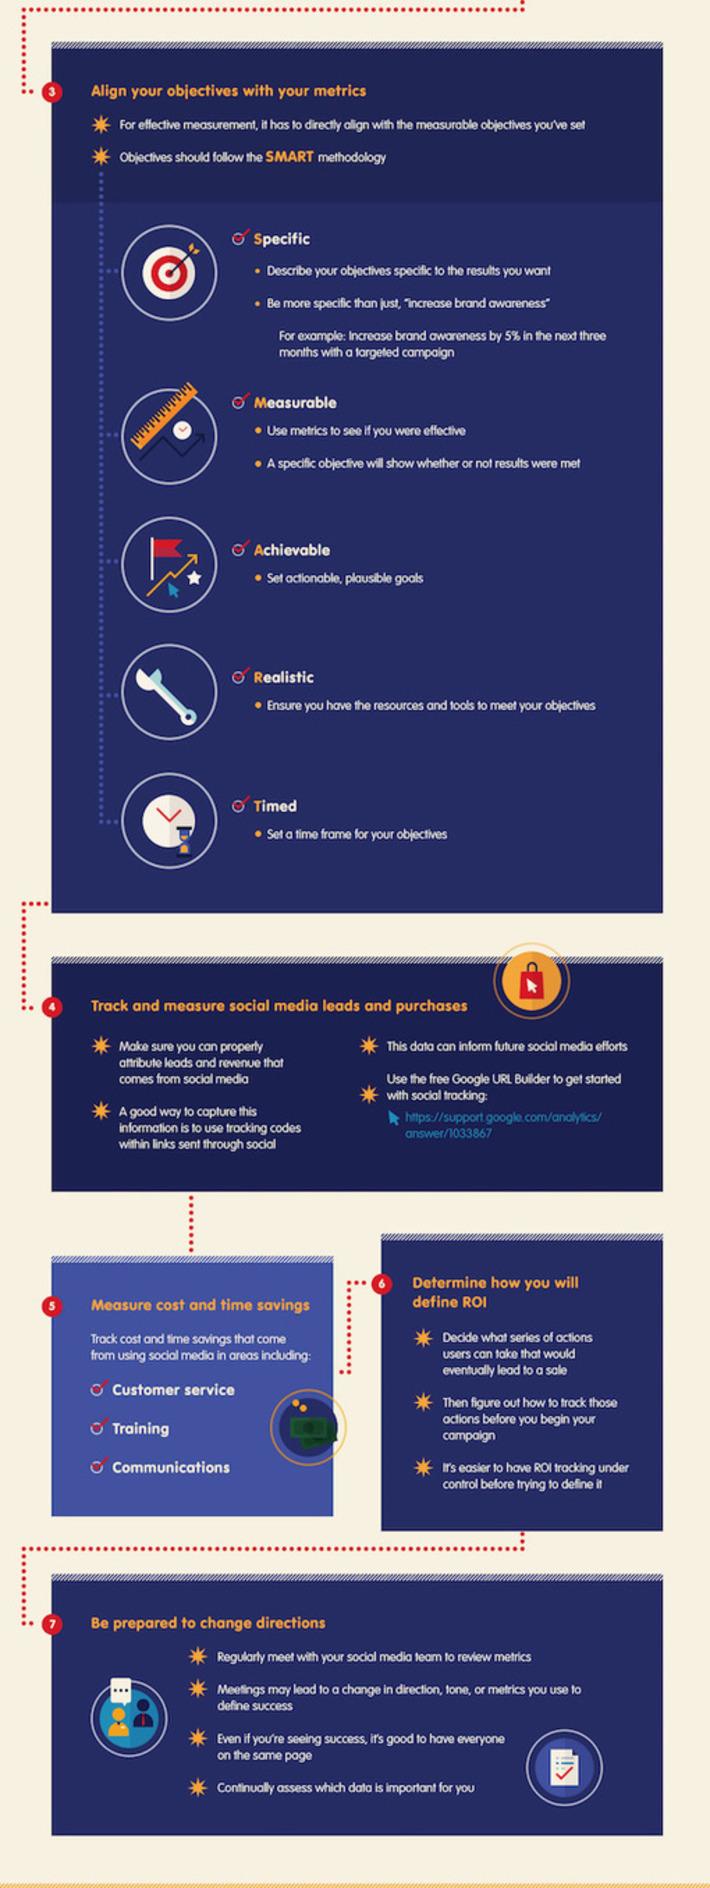 Infographic: Best Practices For Social Media Measurement - DesignTAXI.com | Social Media Sentiment | Scoop.it